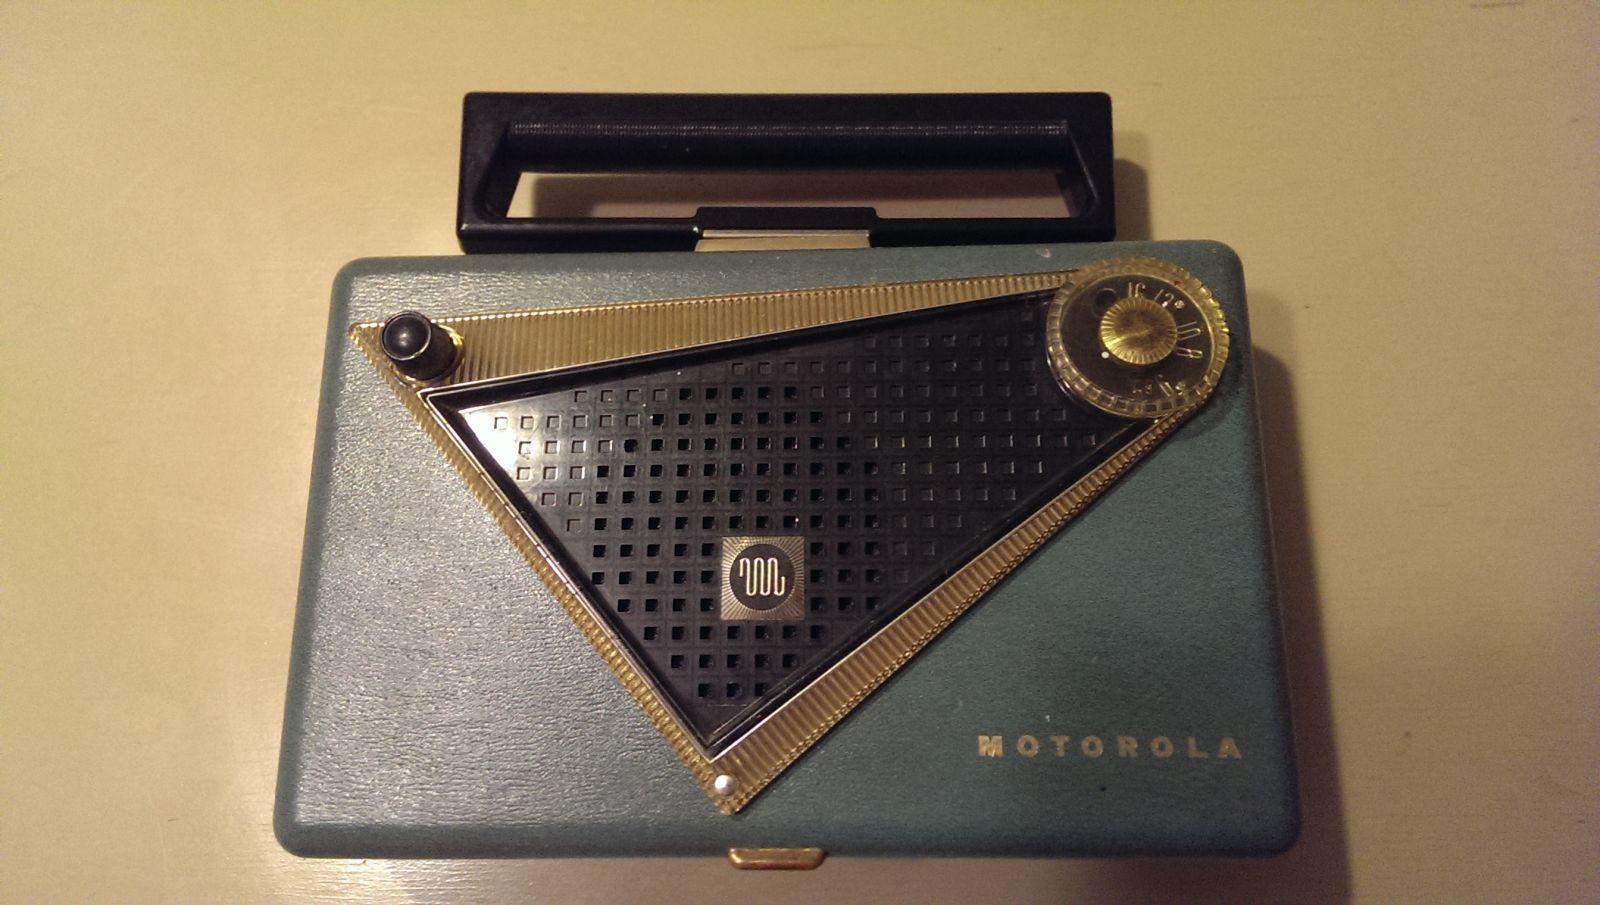 1950's Motorola Portable Radio